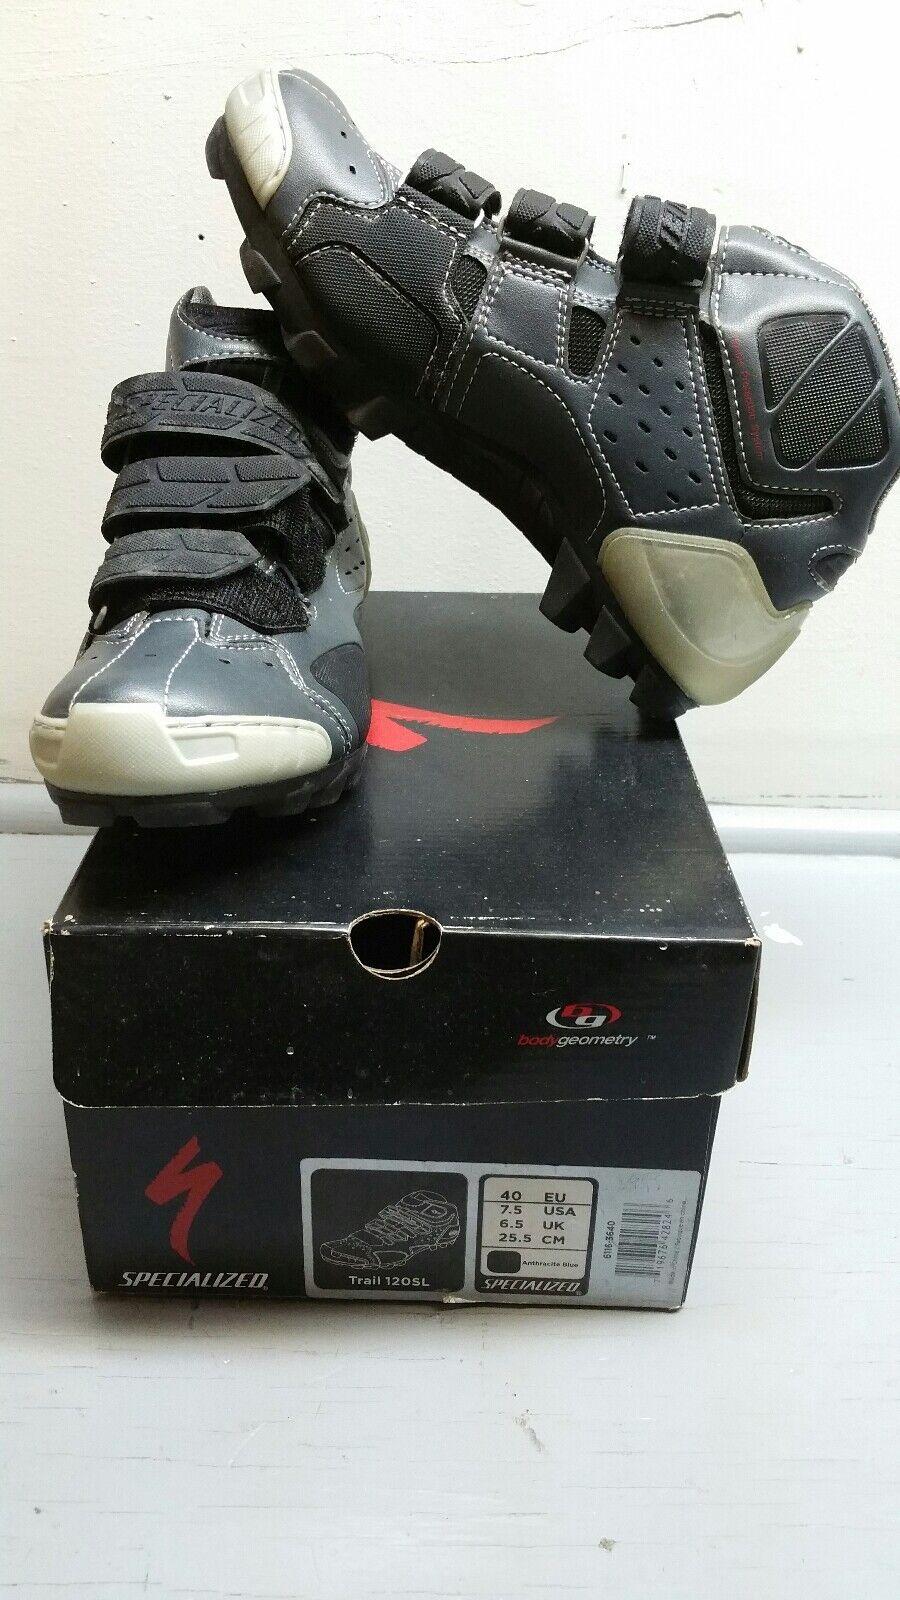 NIB Carbon Specialized Trail 120SL mountain biking shoes Size 40 Euro; 7.5 US